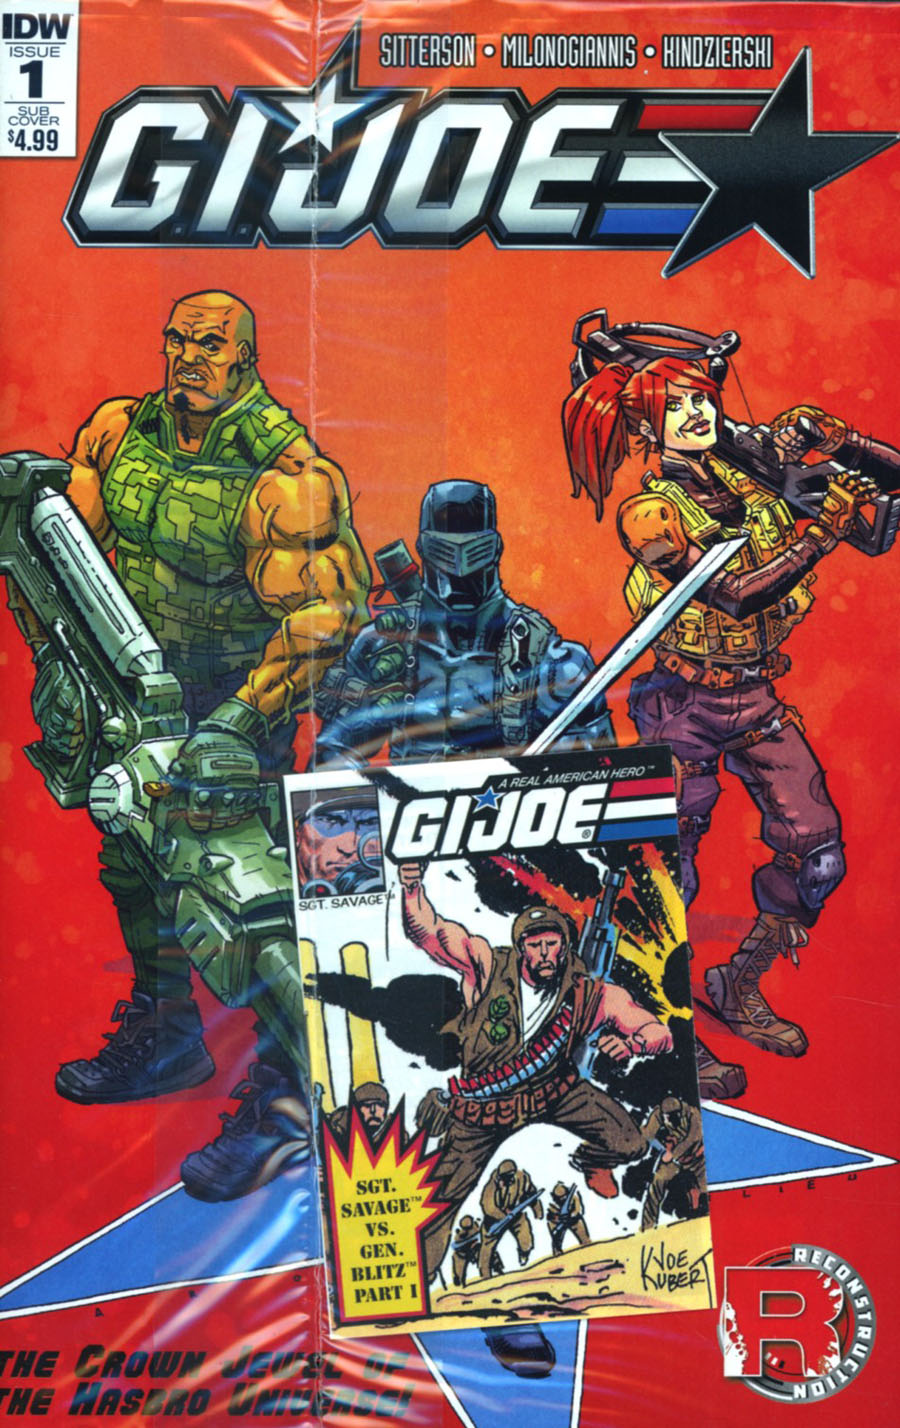 GI Joe Vol 8 #1 Cover D Variant Aaron Conley Micro Comic Cover